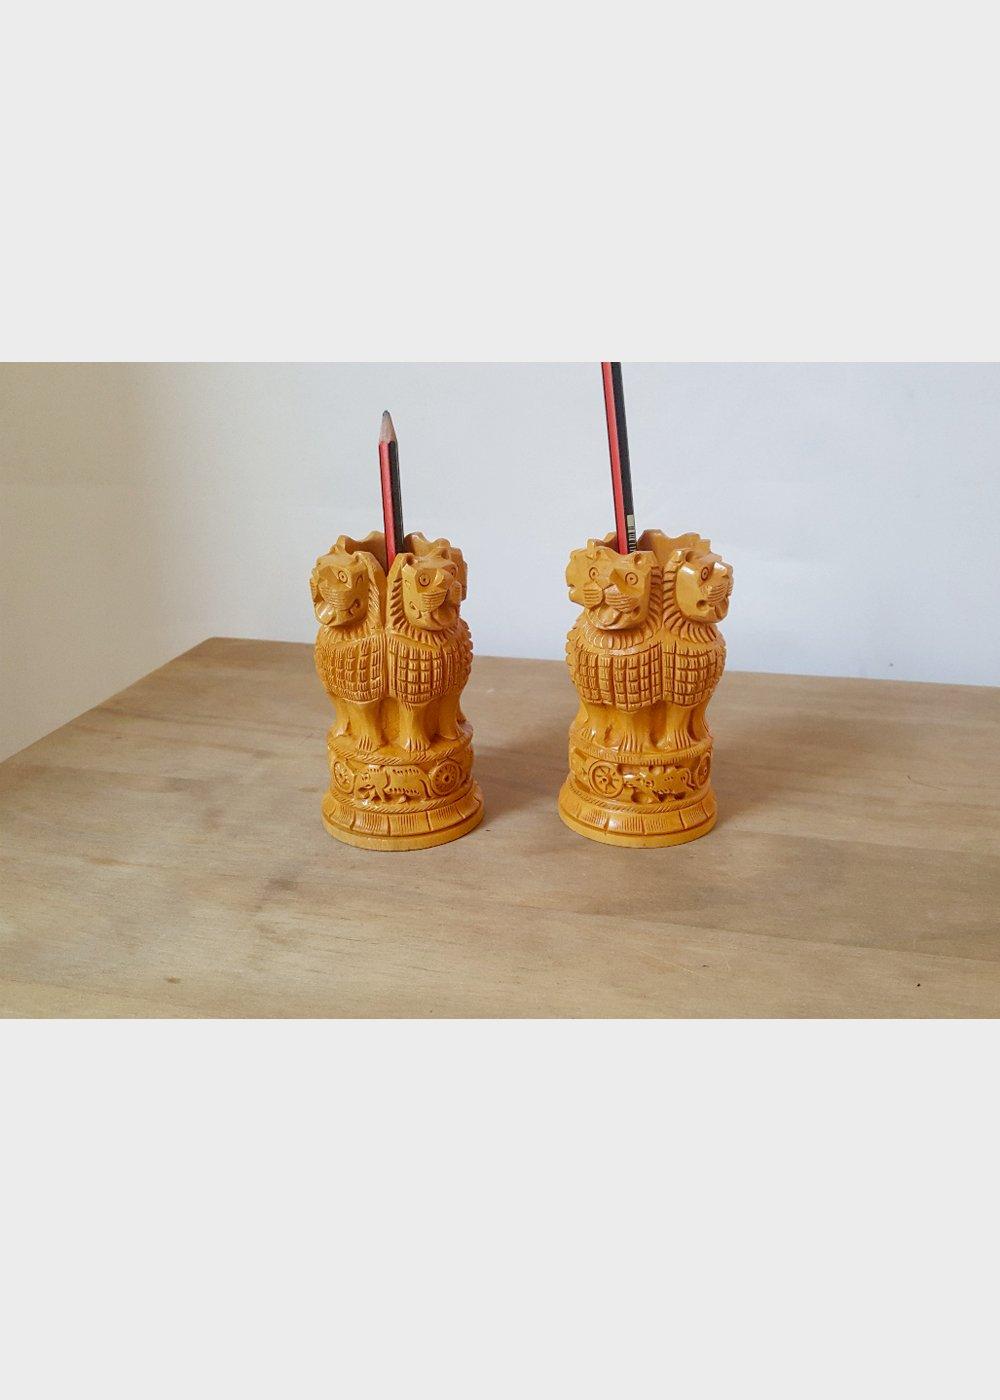 Hand Carved National Symbol Ashok Stambh Pen Pot